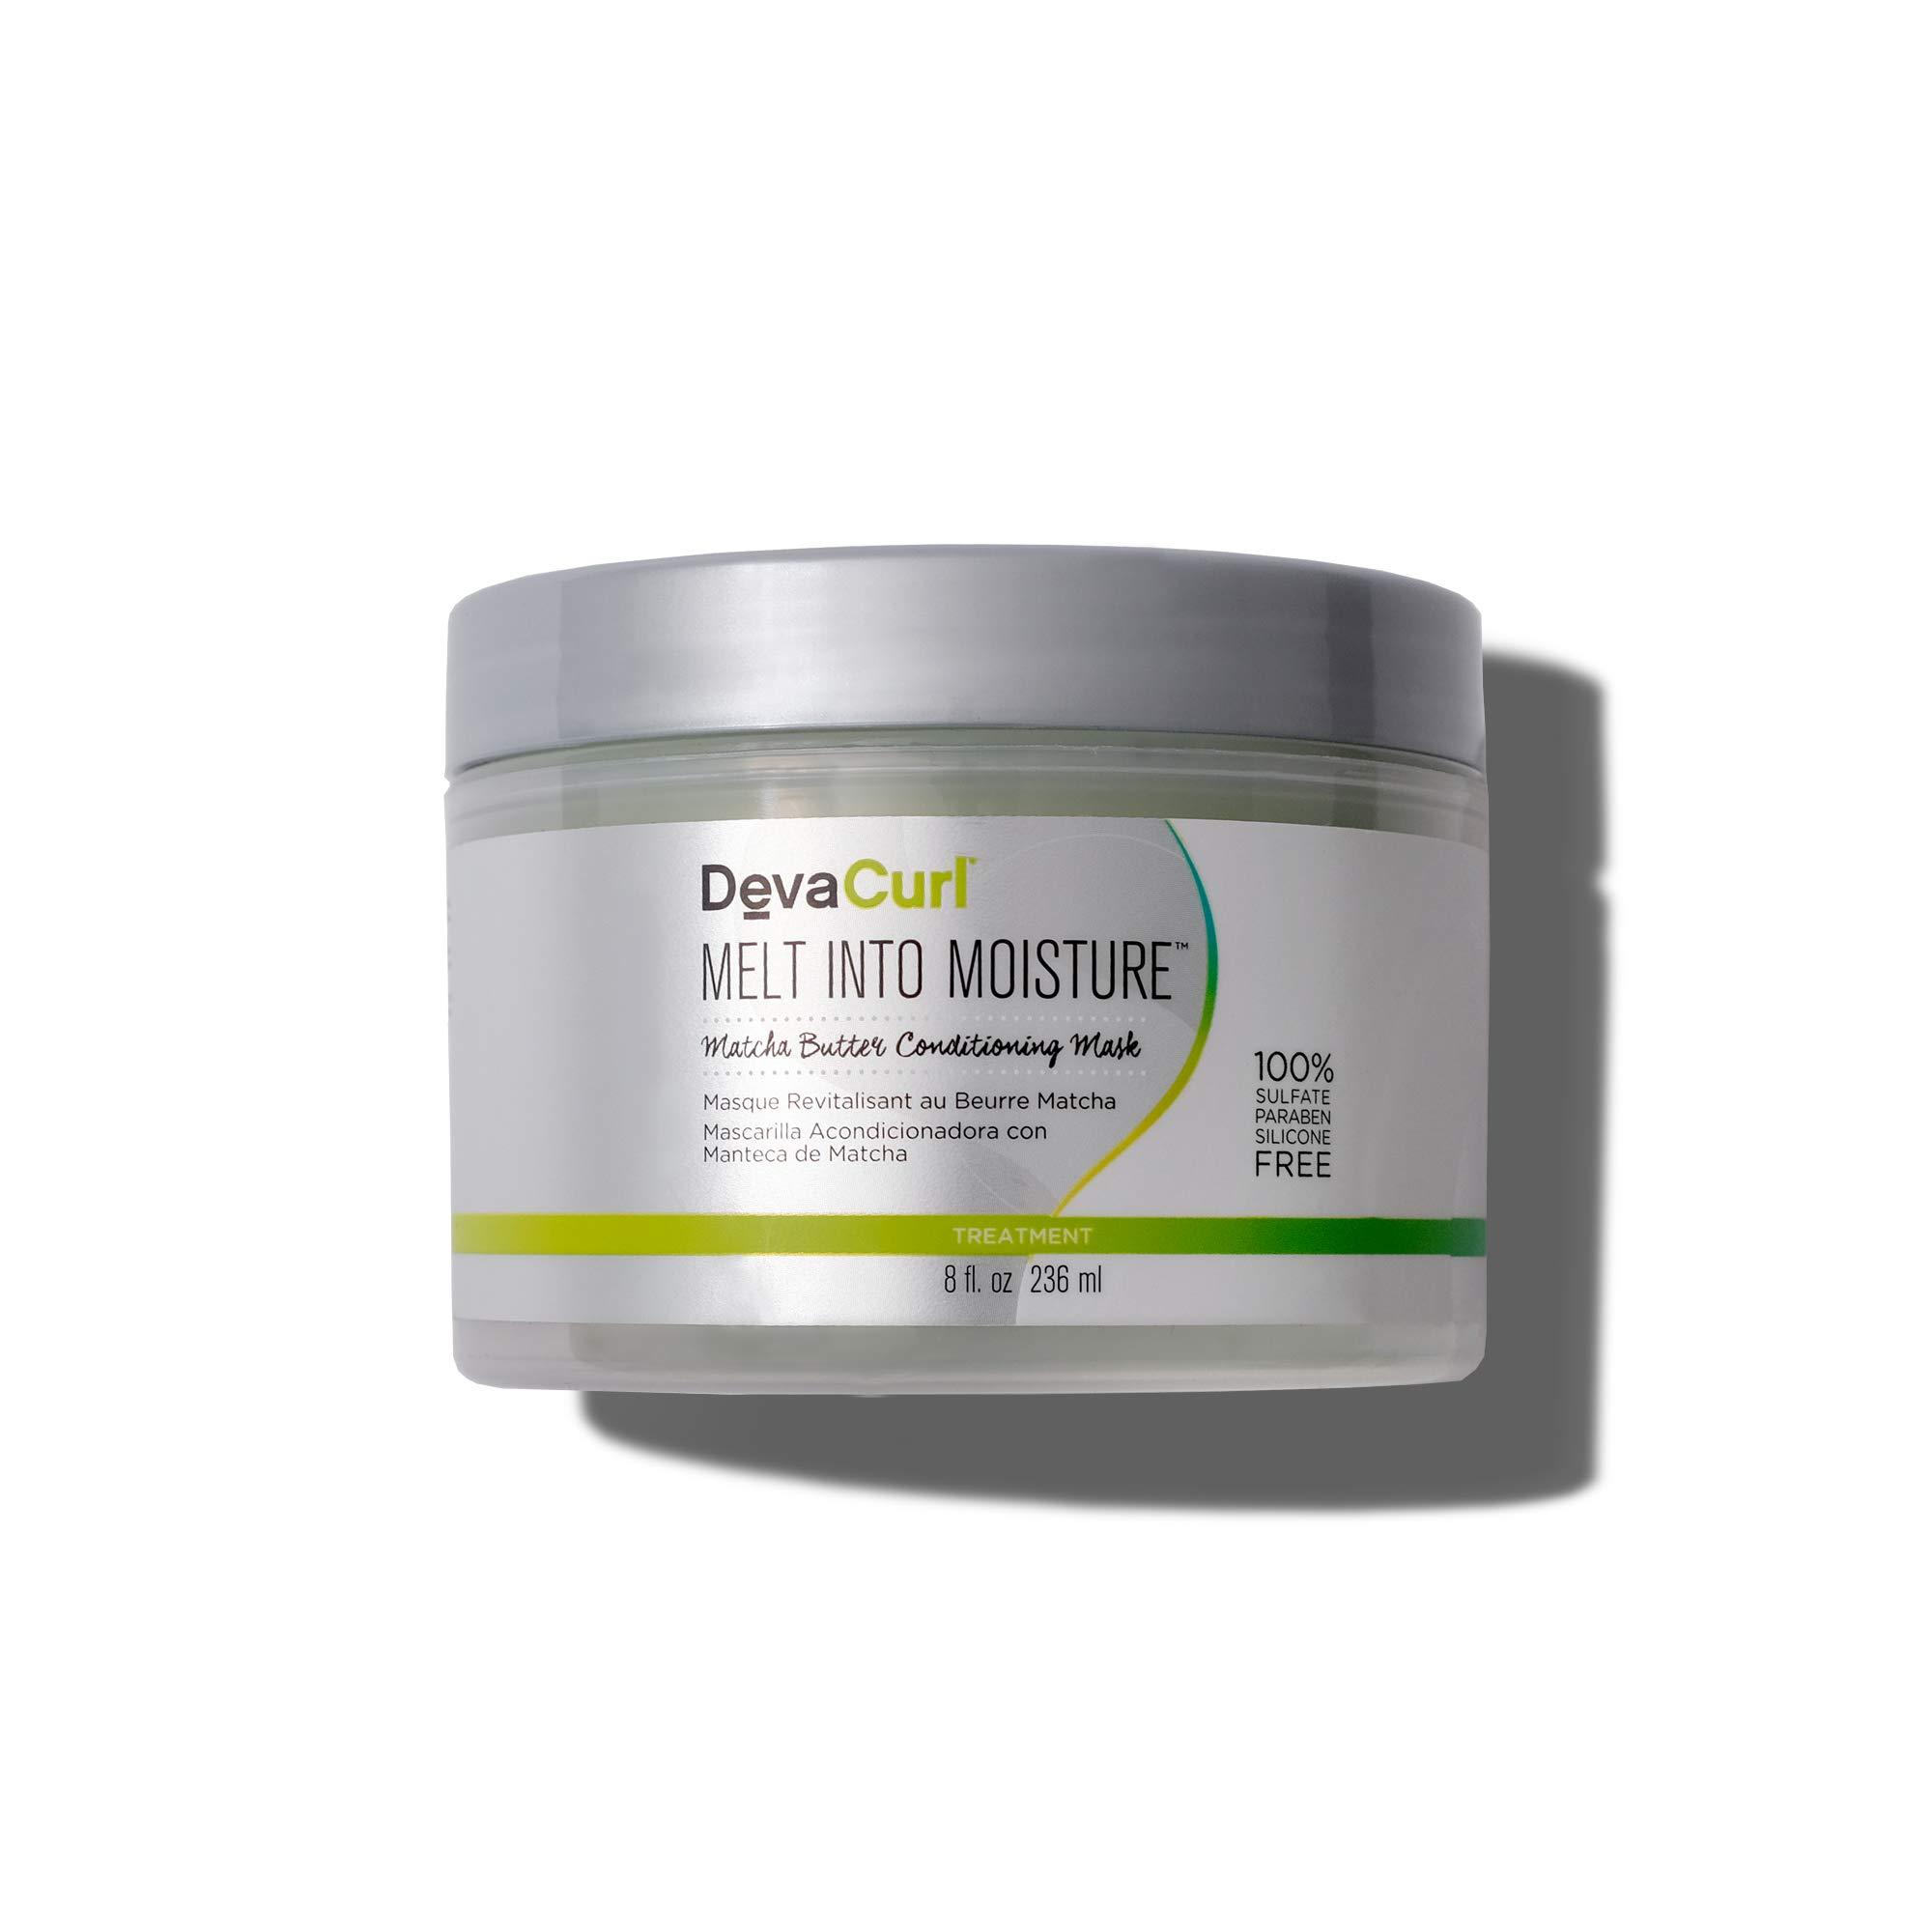 DevaCurl Melt Into Moisture Conditioning Mask, 8oz by DevaCurl